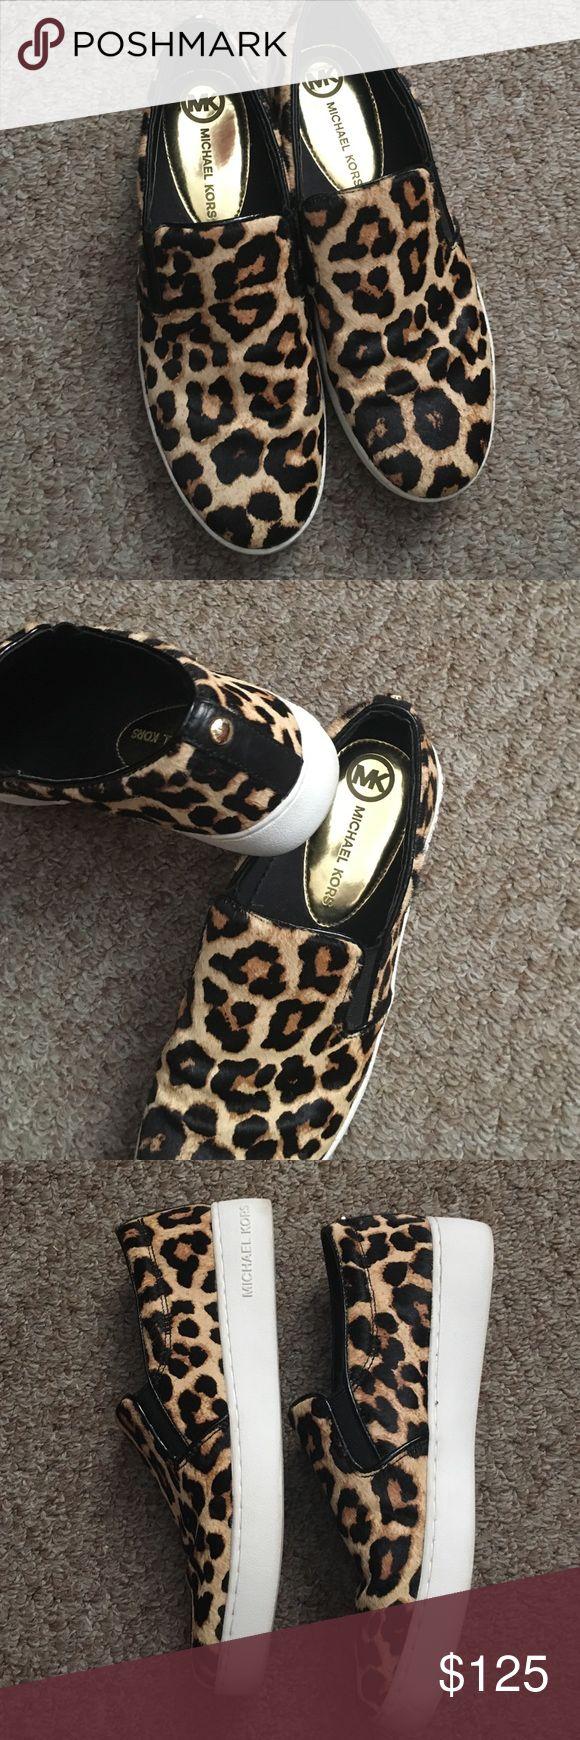 Reserved for @jonesjasmine88 Michael Kors Leopard Authentic Michael Kors leopard print slip on shoes. Worn once. Excellent condition. Michael Kors Shoes Flats & Loafers